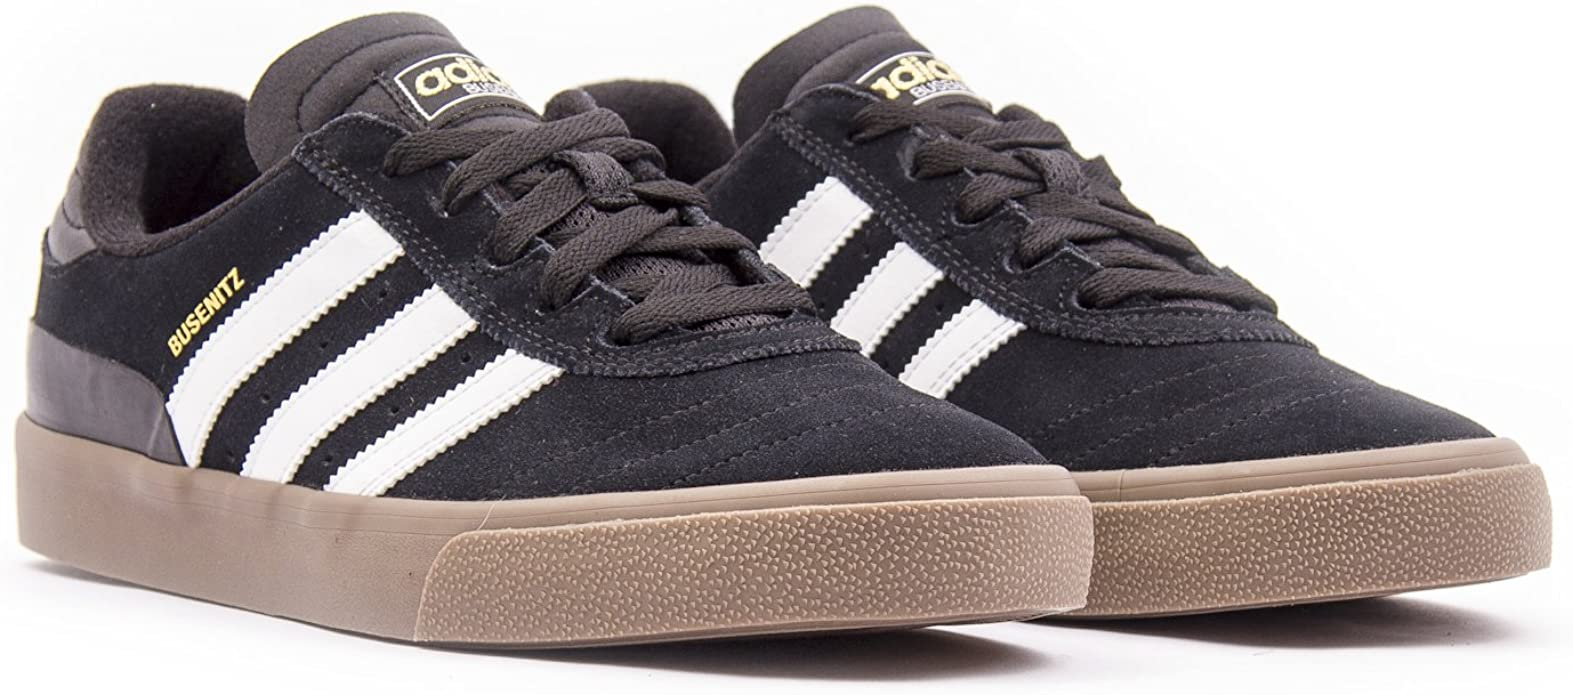 Nylon Punto de exclamación Retocar  Adidas Busenitz Vulc Black/White/Gum Shoes: Amazon.ca: Shoes & Handbags